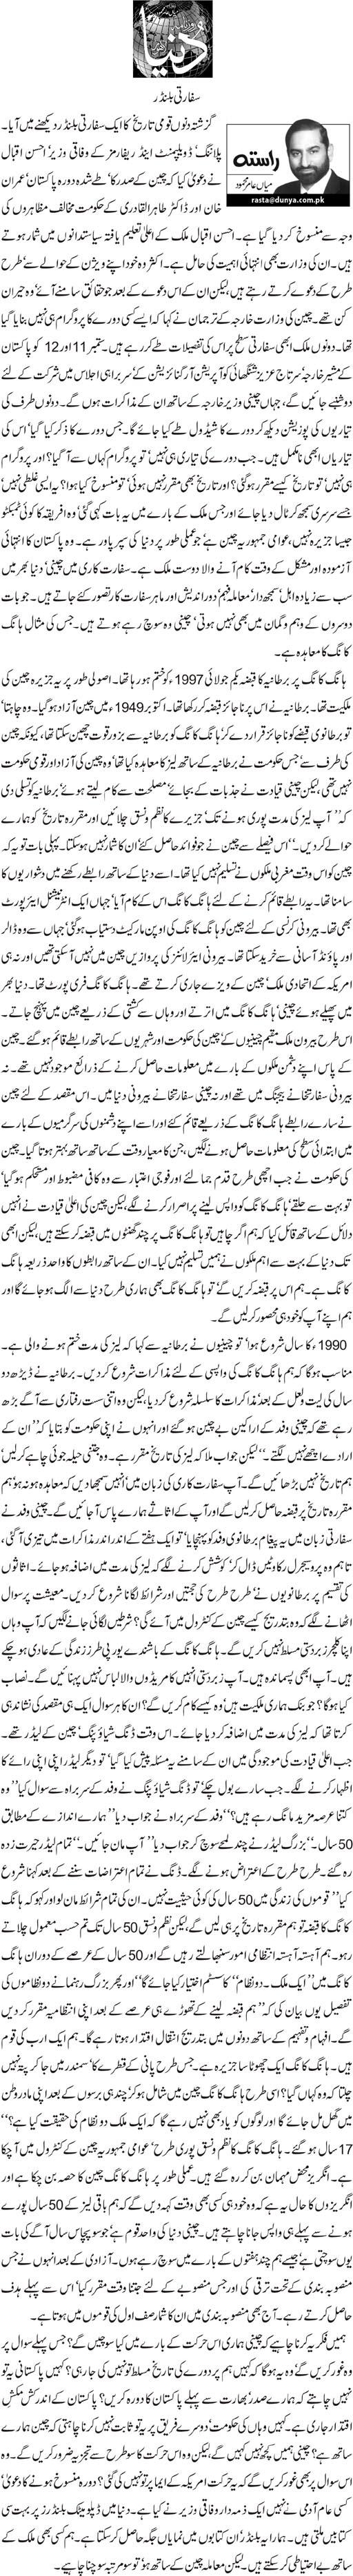 Print Media Coverage Daily Dunya - Mian Amir Mahmood